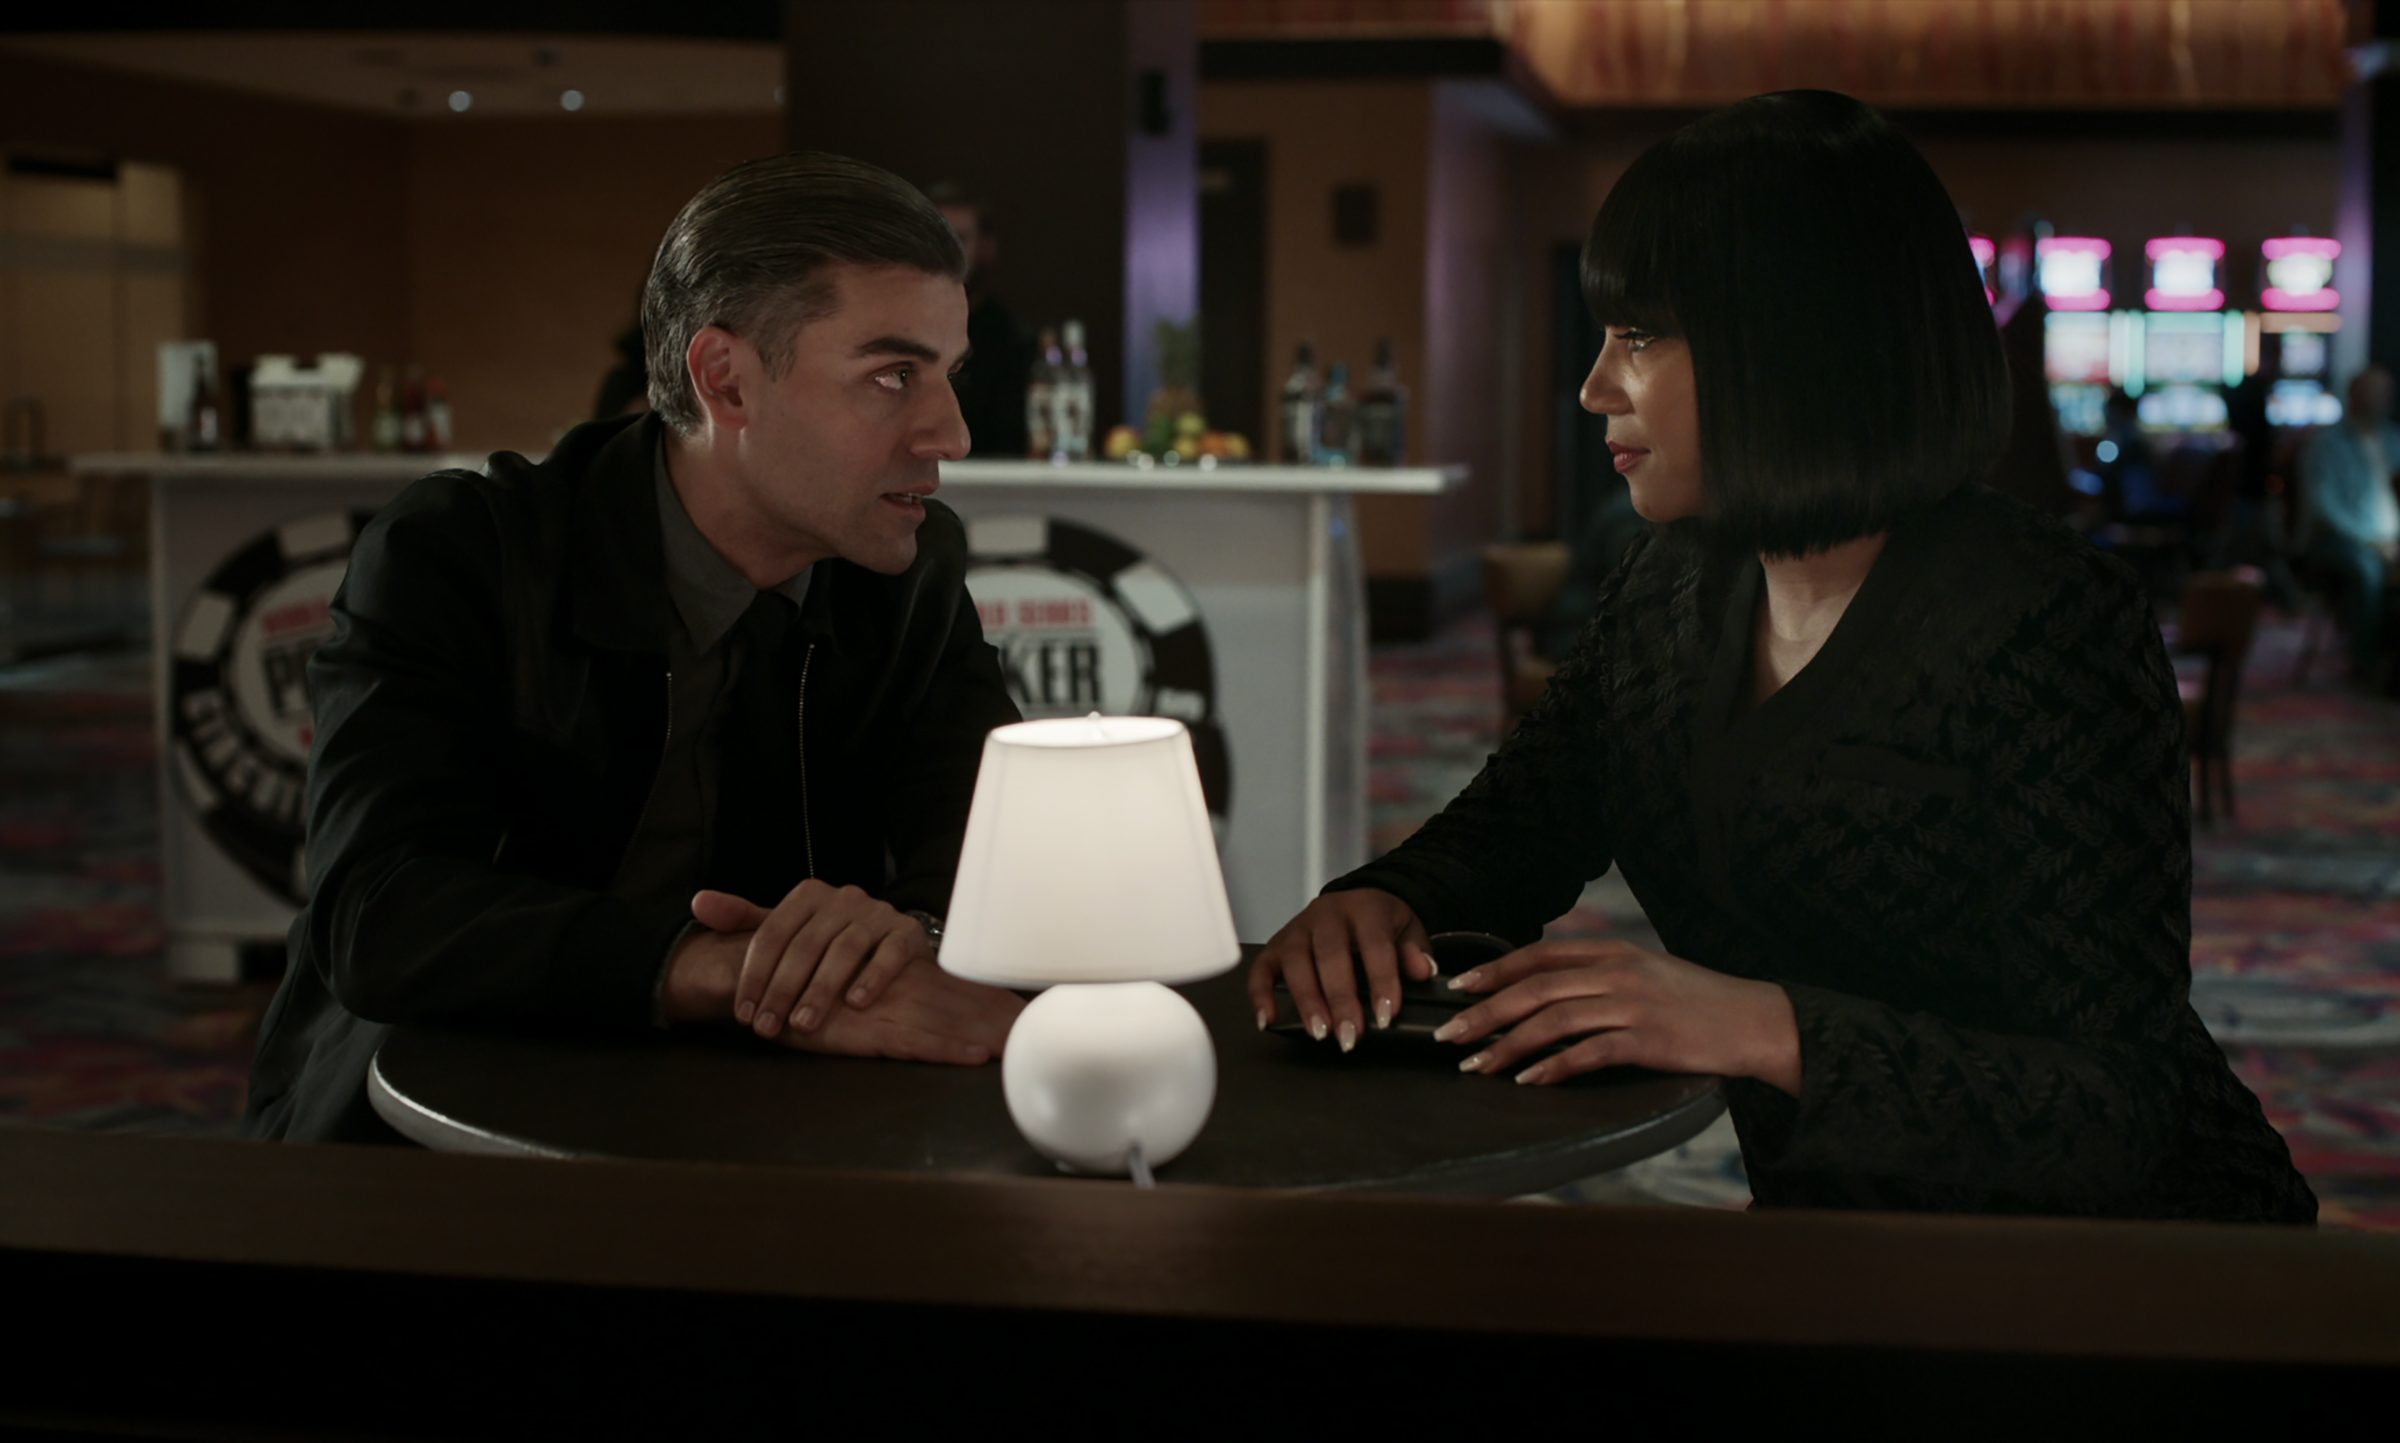 Oscar Isaac as William Tell and Tiffany Haddish as La Linda in The Card Counter.